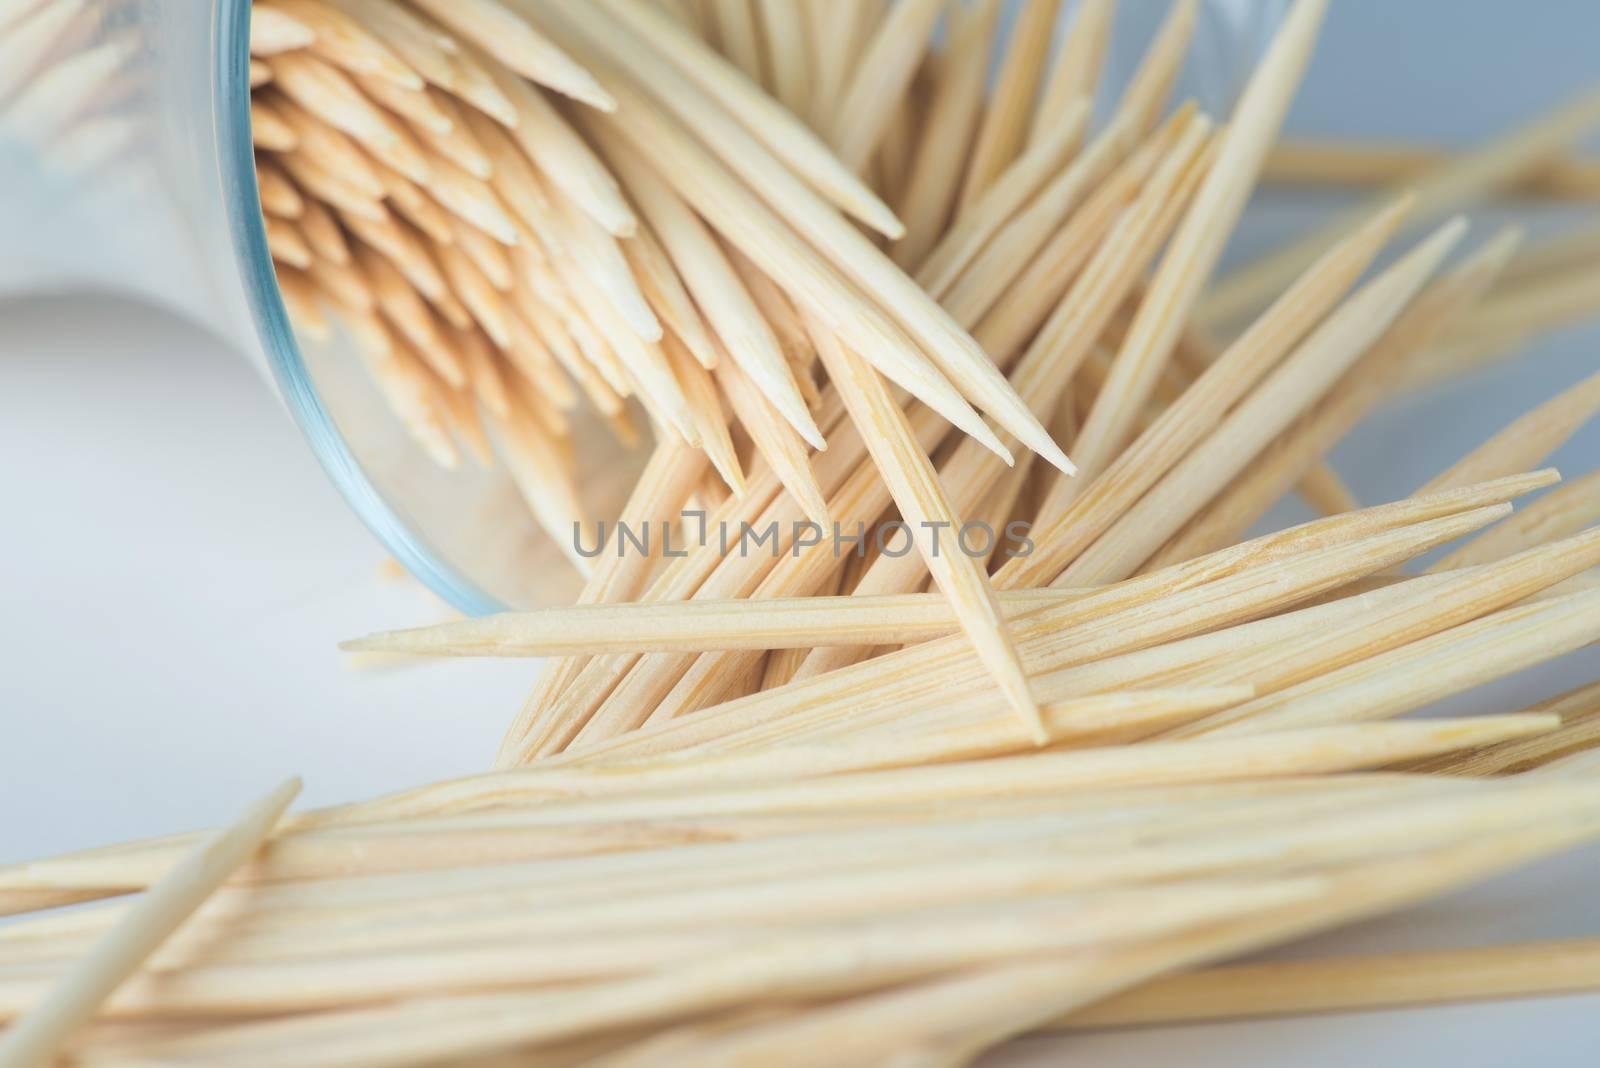 Wooden toothpicks on a light background, closeup